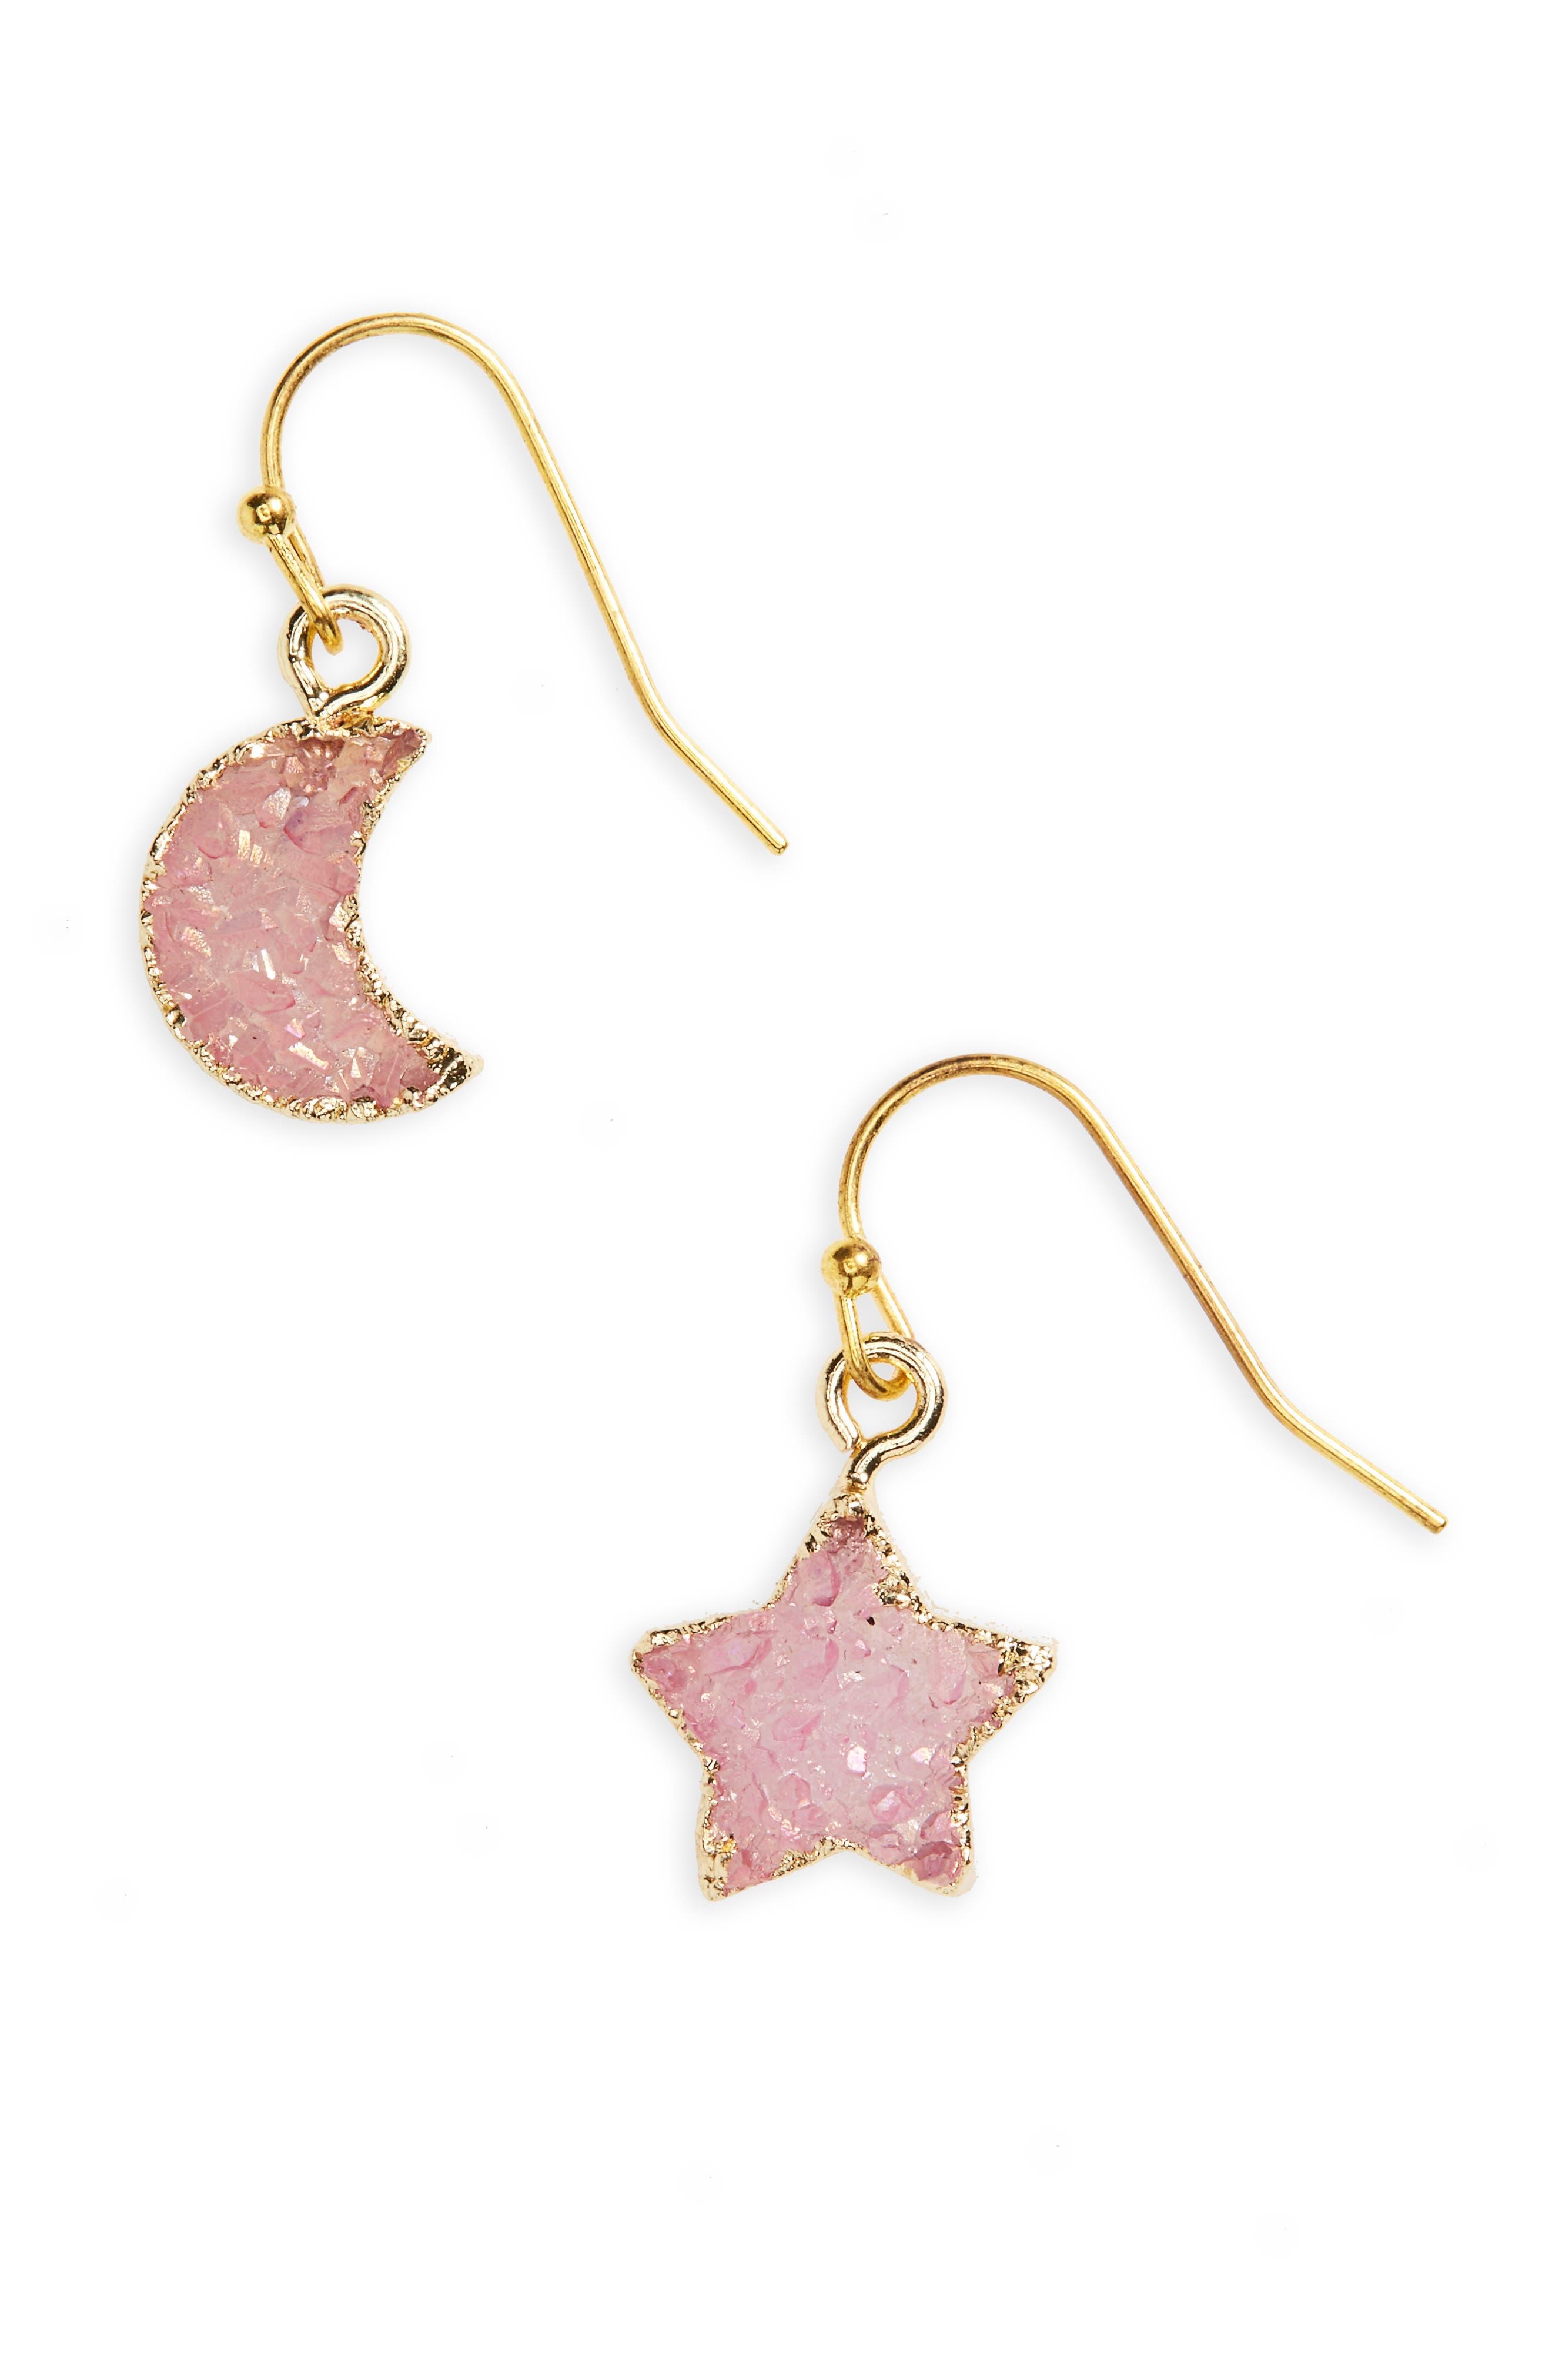 Moon & Star Drusy Stone Earrings,                             Main thumbnail 1, color,                             670